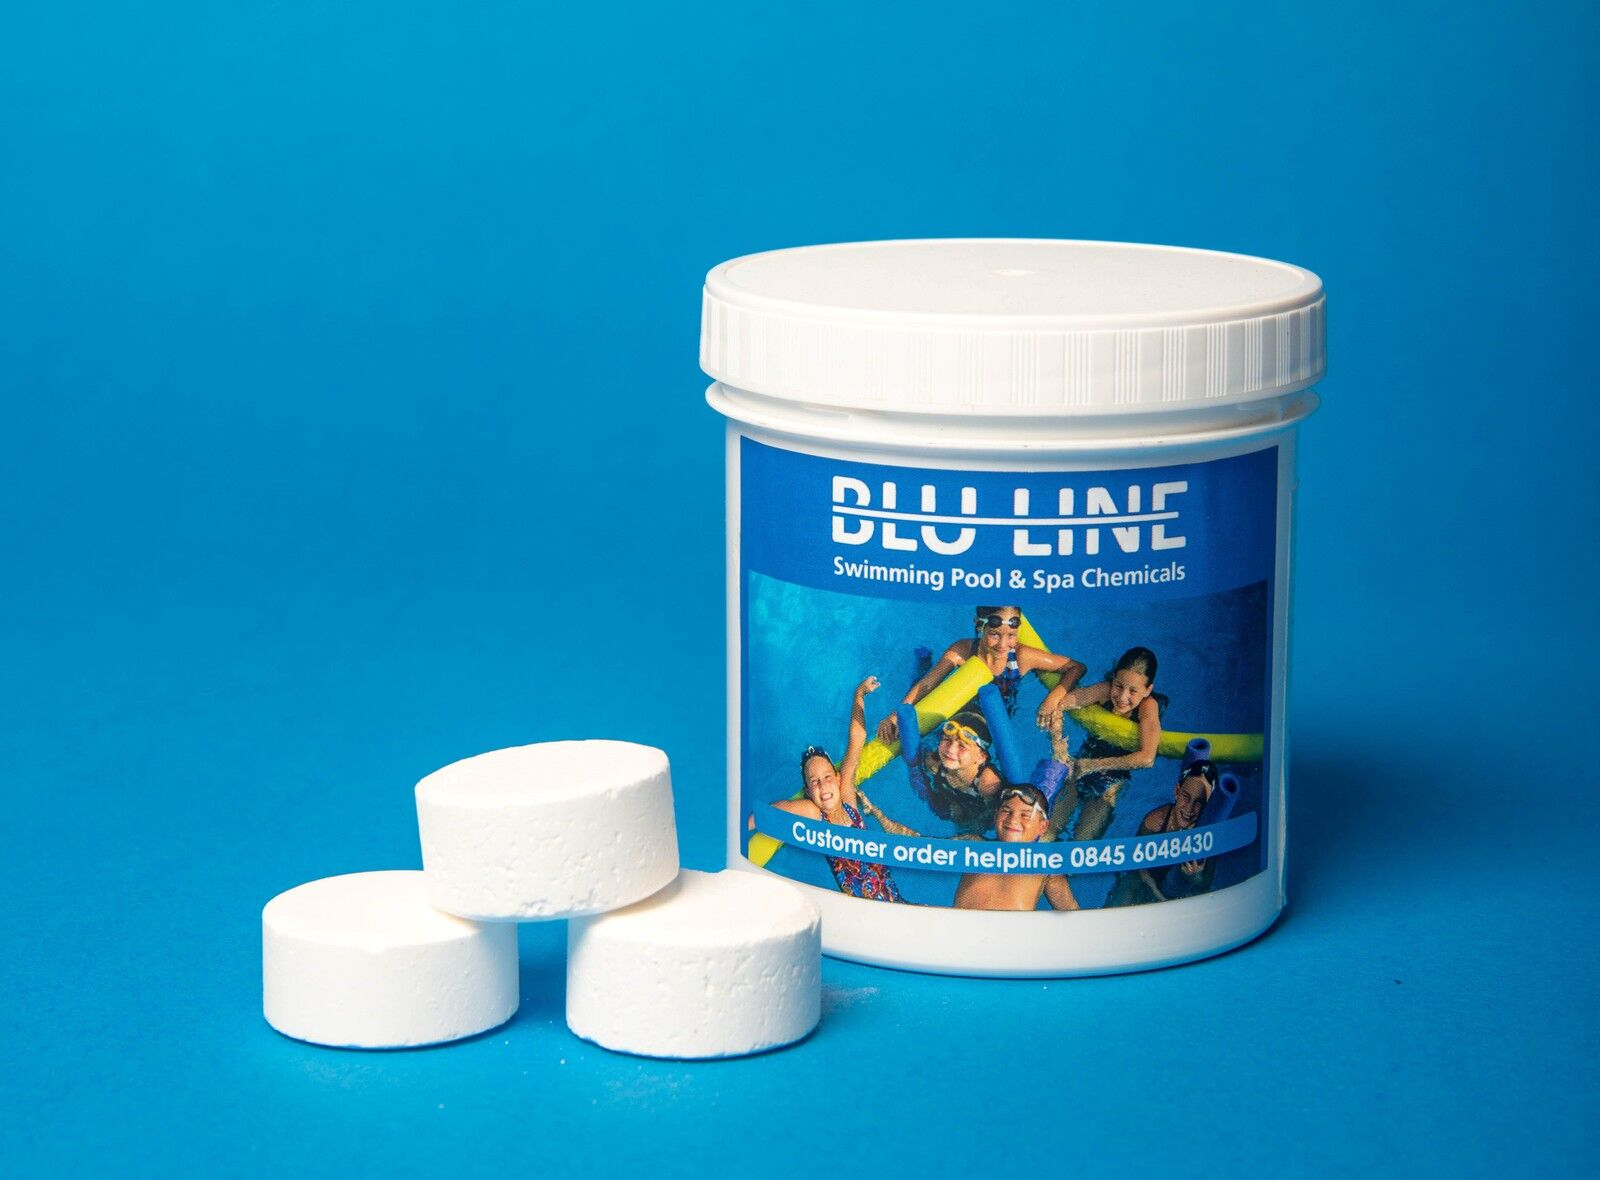 30 X Small Multifuntional Chlorine Tablets Pool Hot Tub 662712993232 Ebay